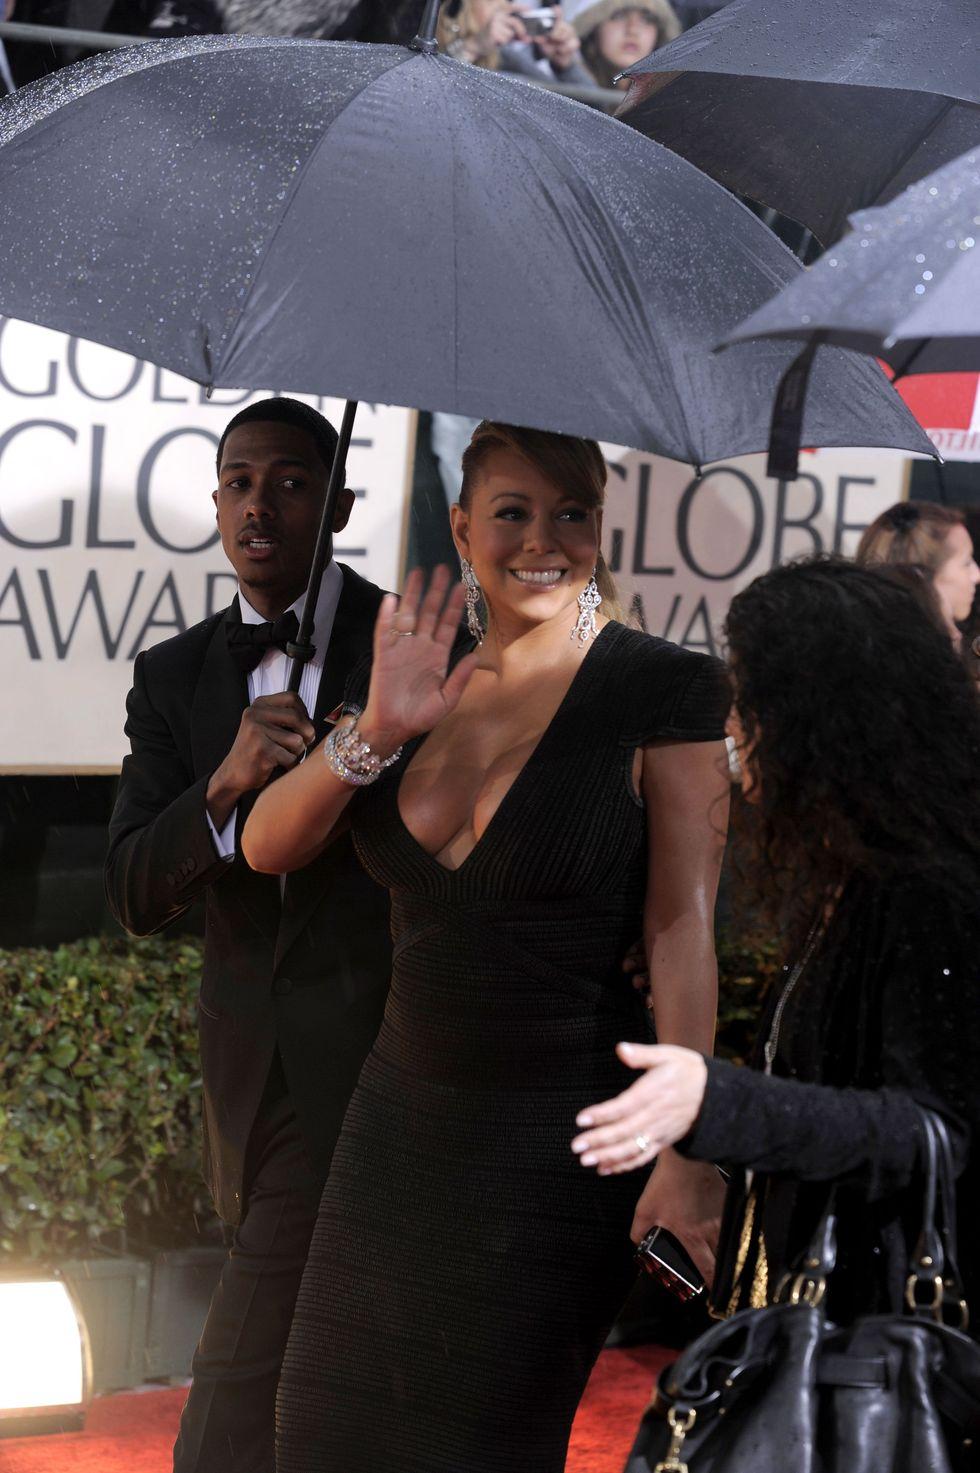 mariah-carey-huge-cleavage-at-2010-golden-globe-awards-01